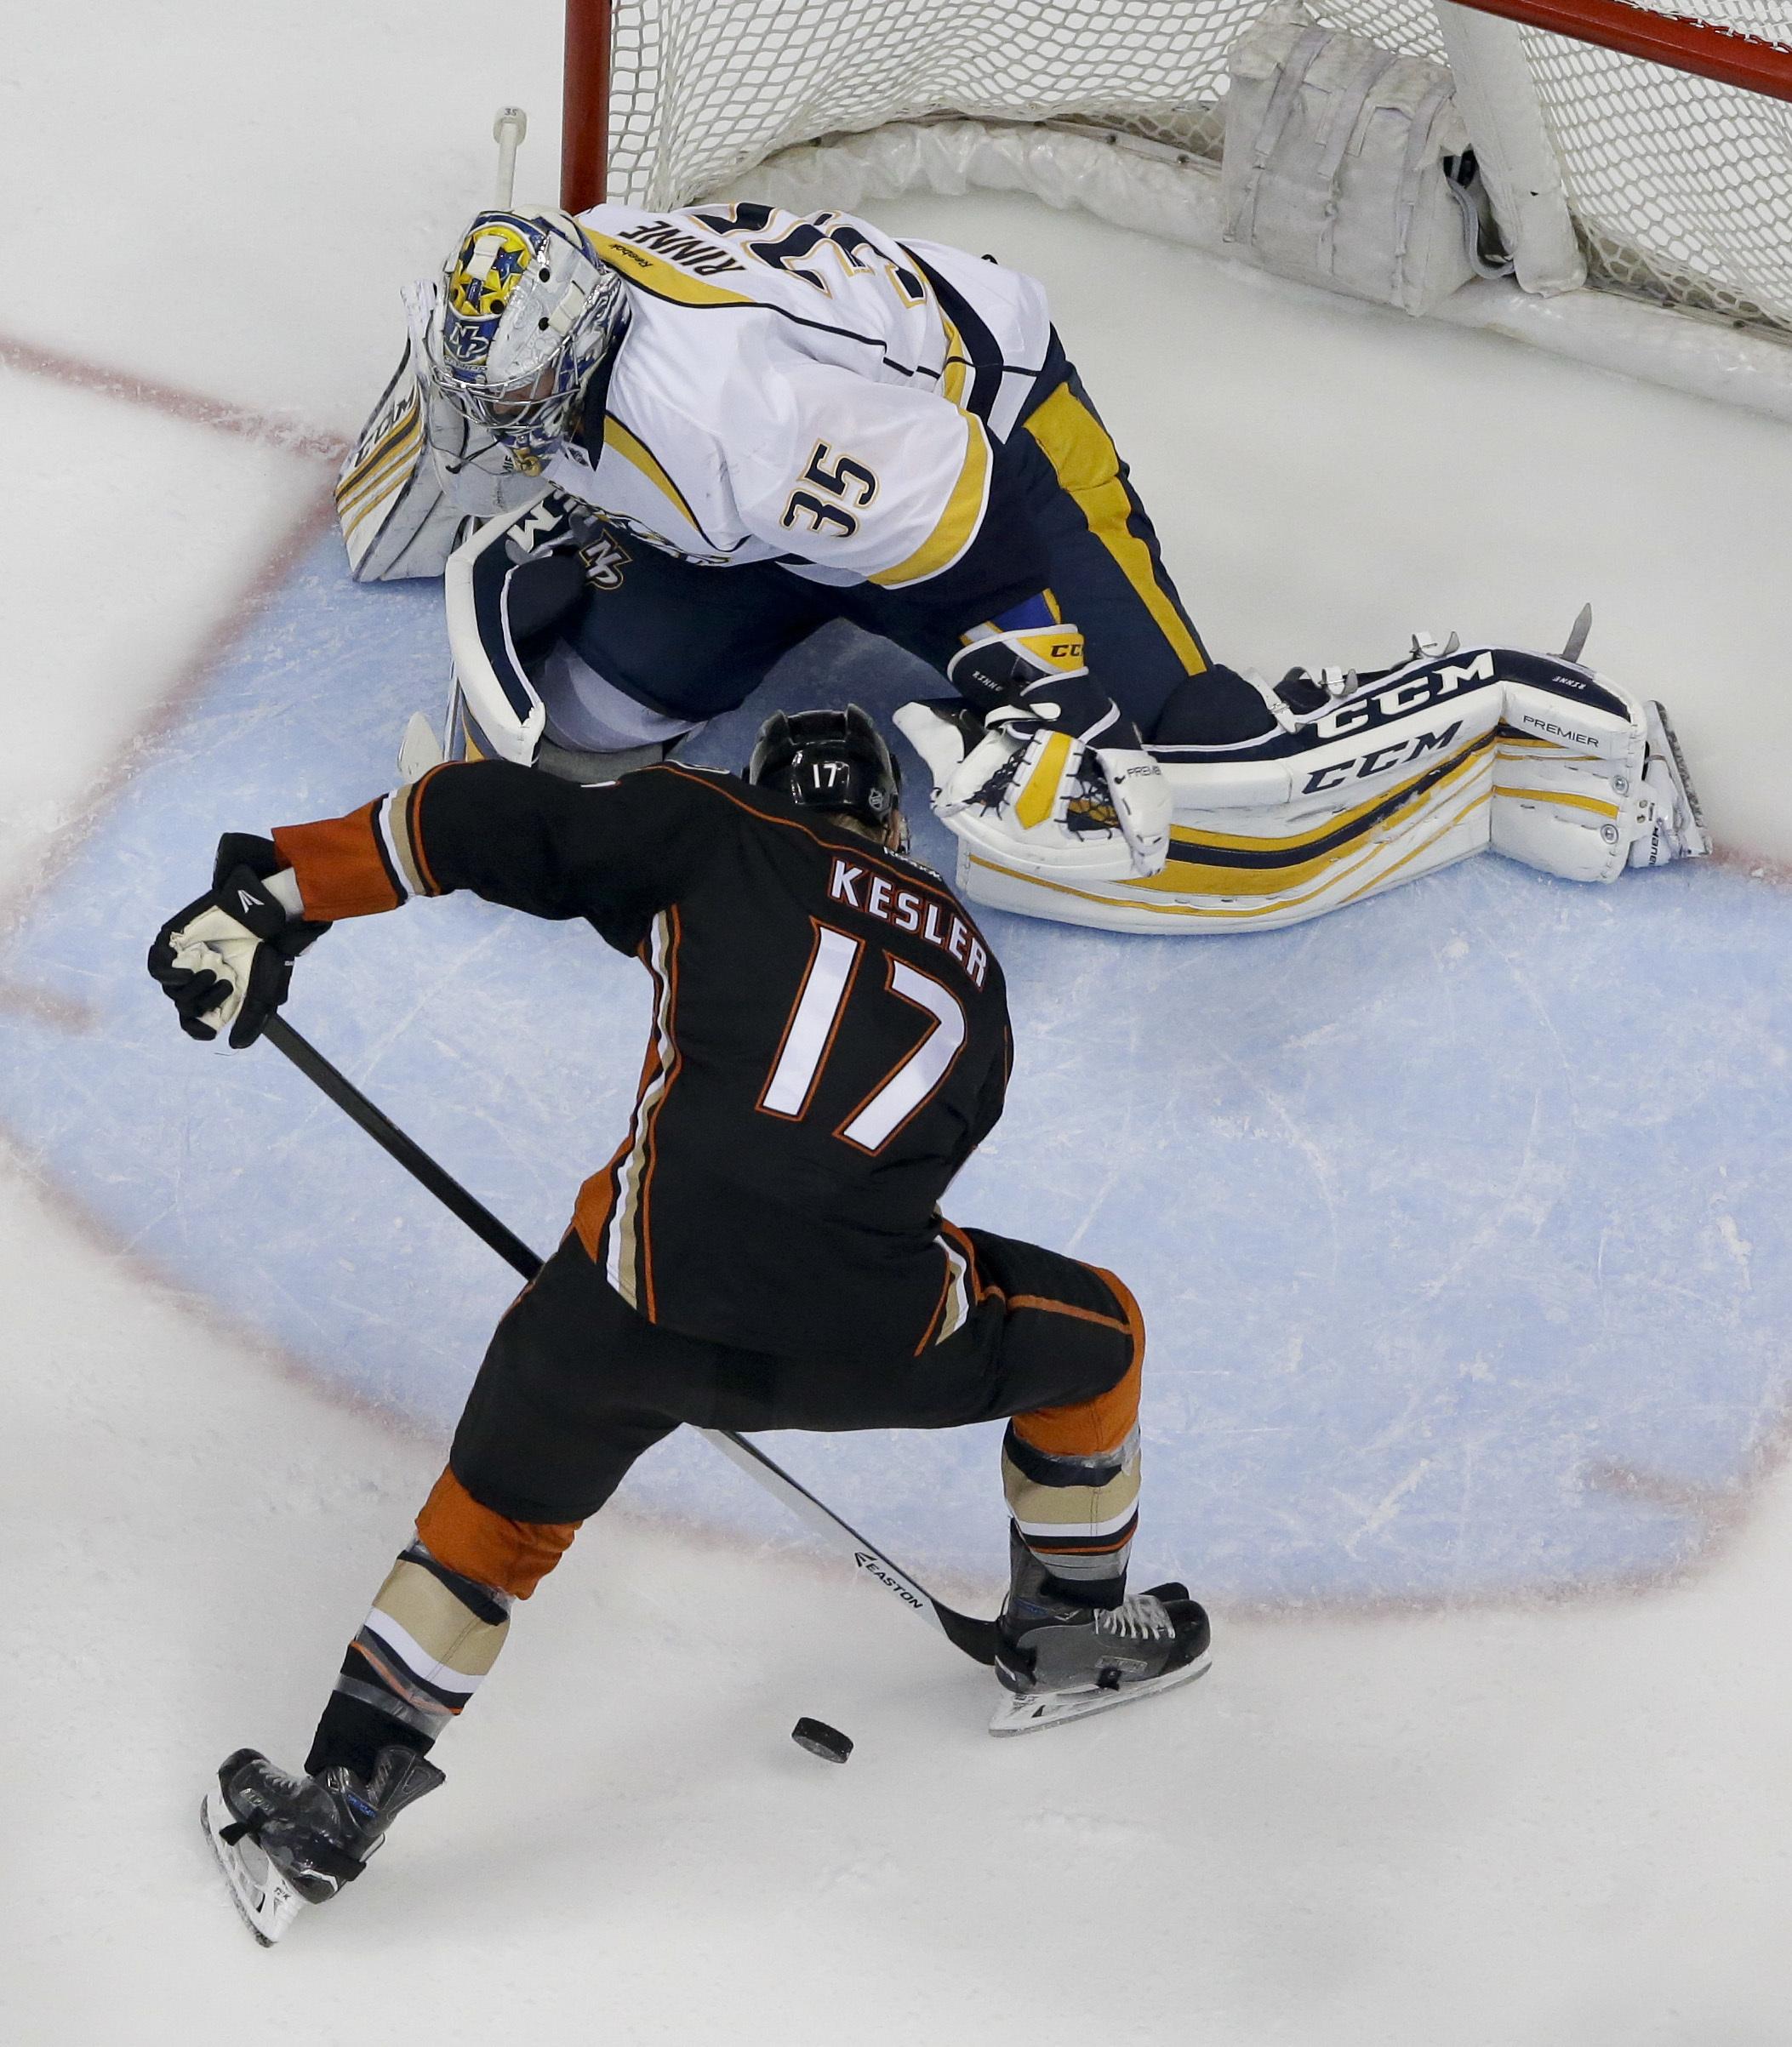 Nashville Predators goalie Pekka Rinne, top, blocks a shot by Anaheim Ducks center Ryan Kesler during the second period of Game 7 in an NHL hockey Stanley Cup playoffs first-round series in Anaheim, Calif., Wednesday, April 27, 2016. (AP Photo/Chris Carls